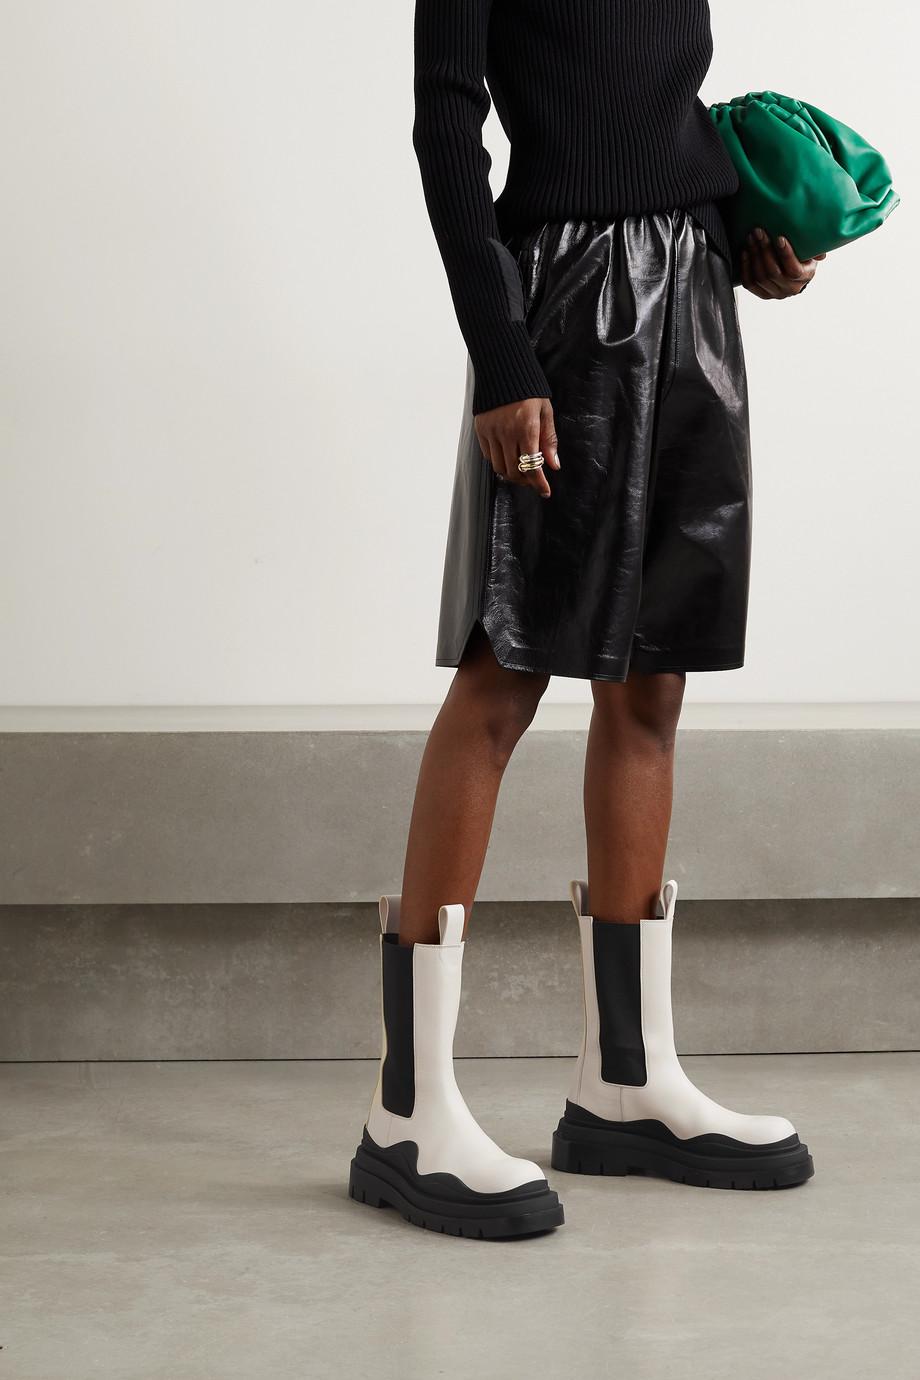 Bottega Veneta Tire rubber-trimmed leather Chelsea boots